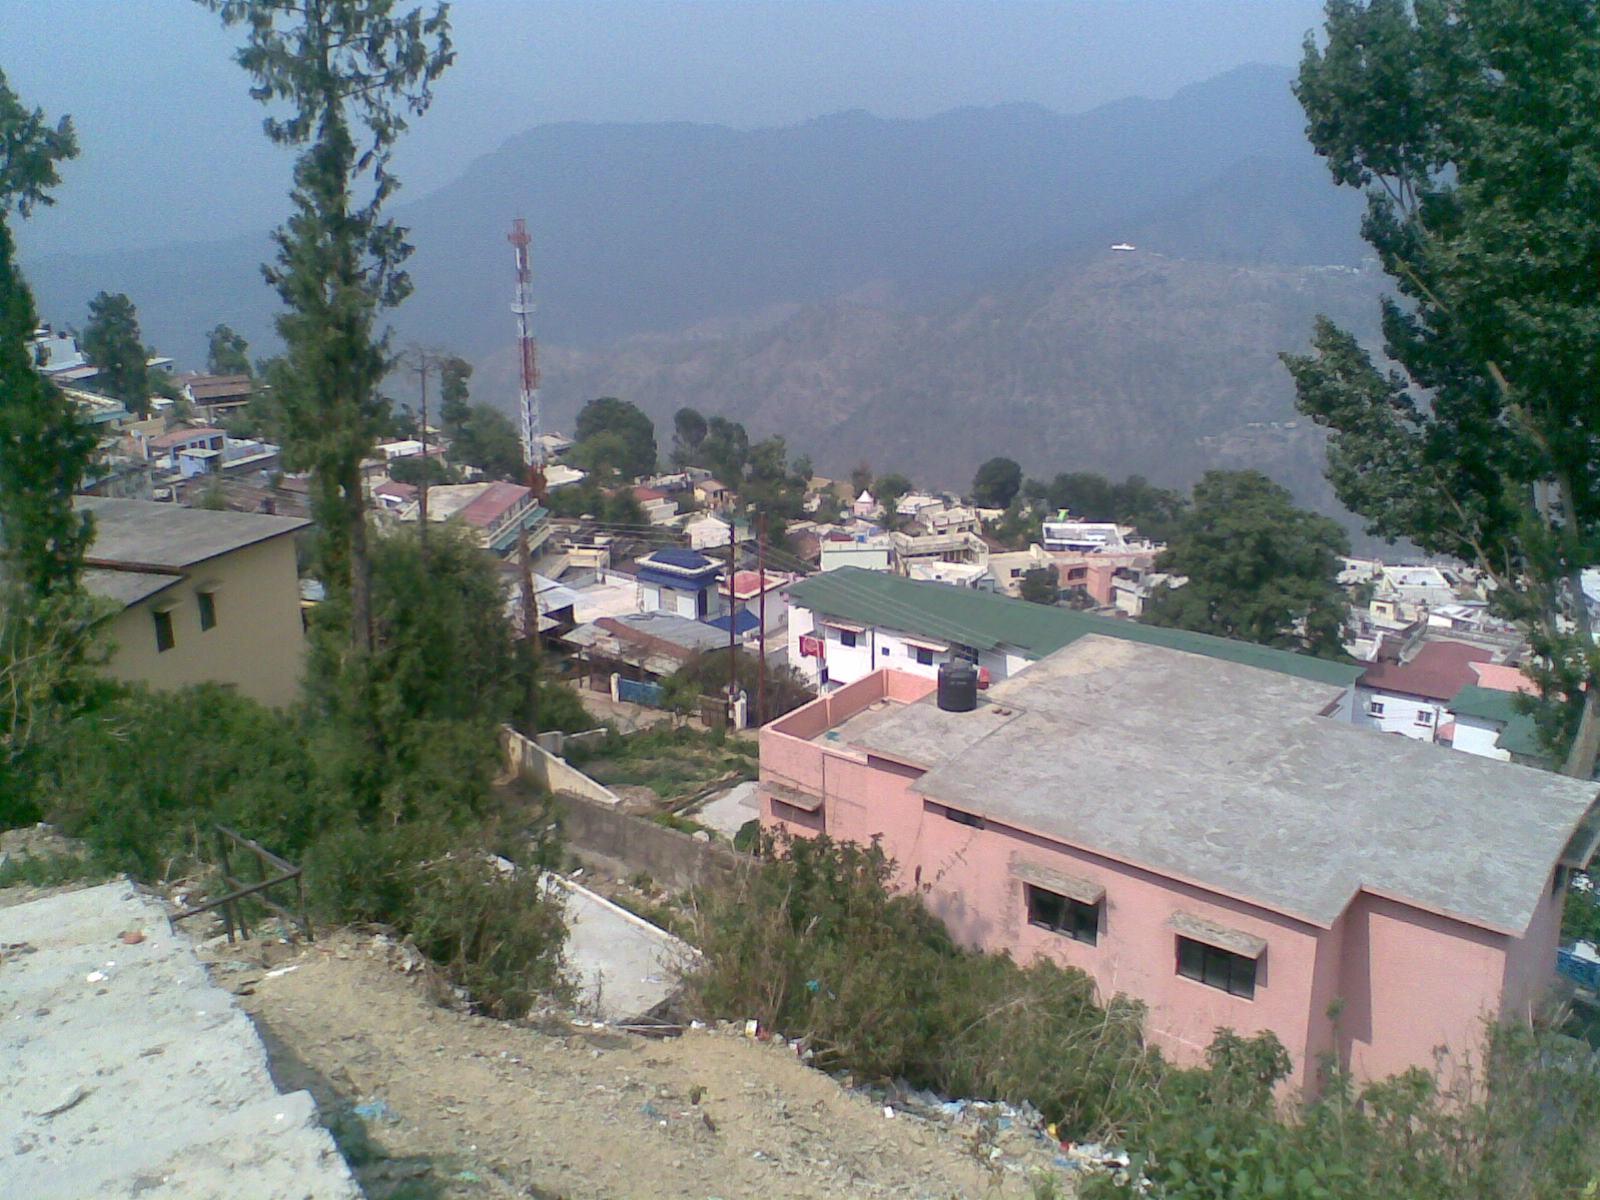 Pauri Garhwal India  city photos gallery : ... Pauri Garhwal, Garhwal Region , Uttarakhand ,India: Pauri Garhwal